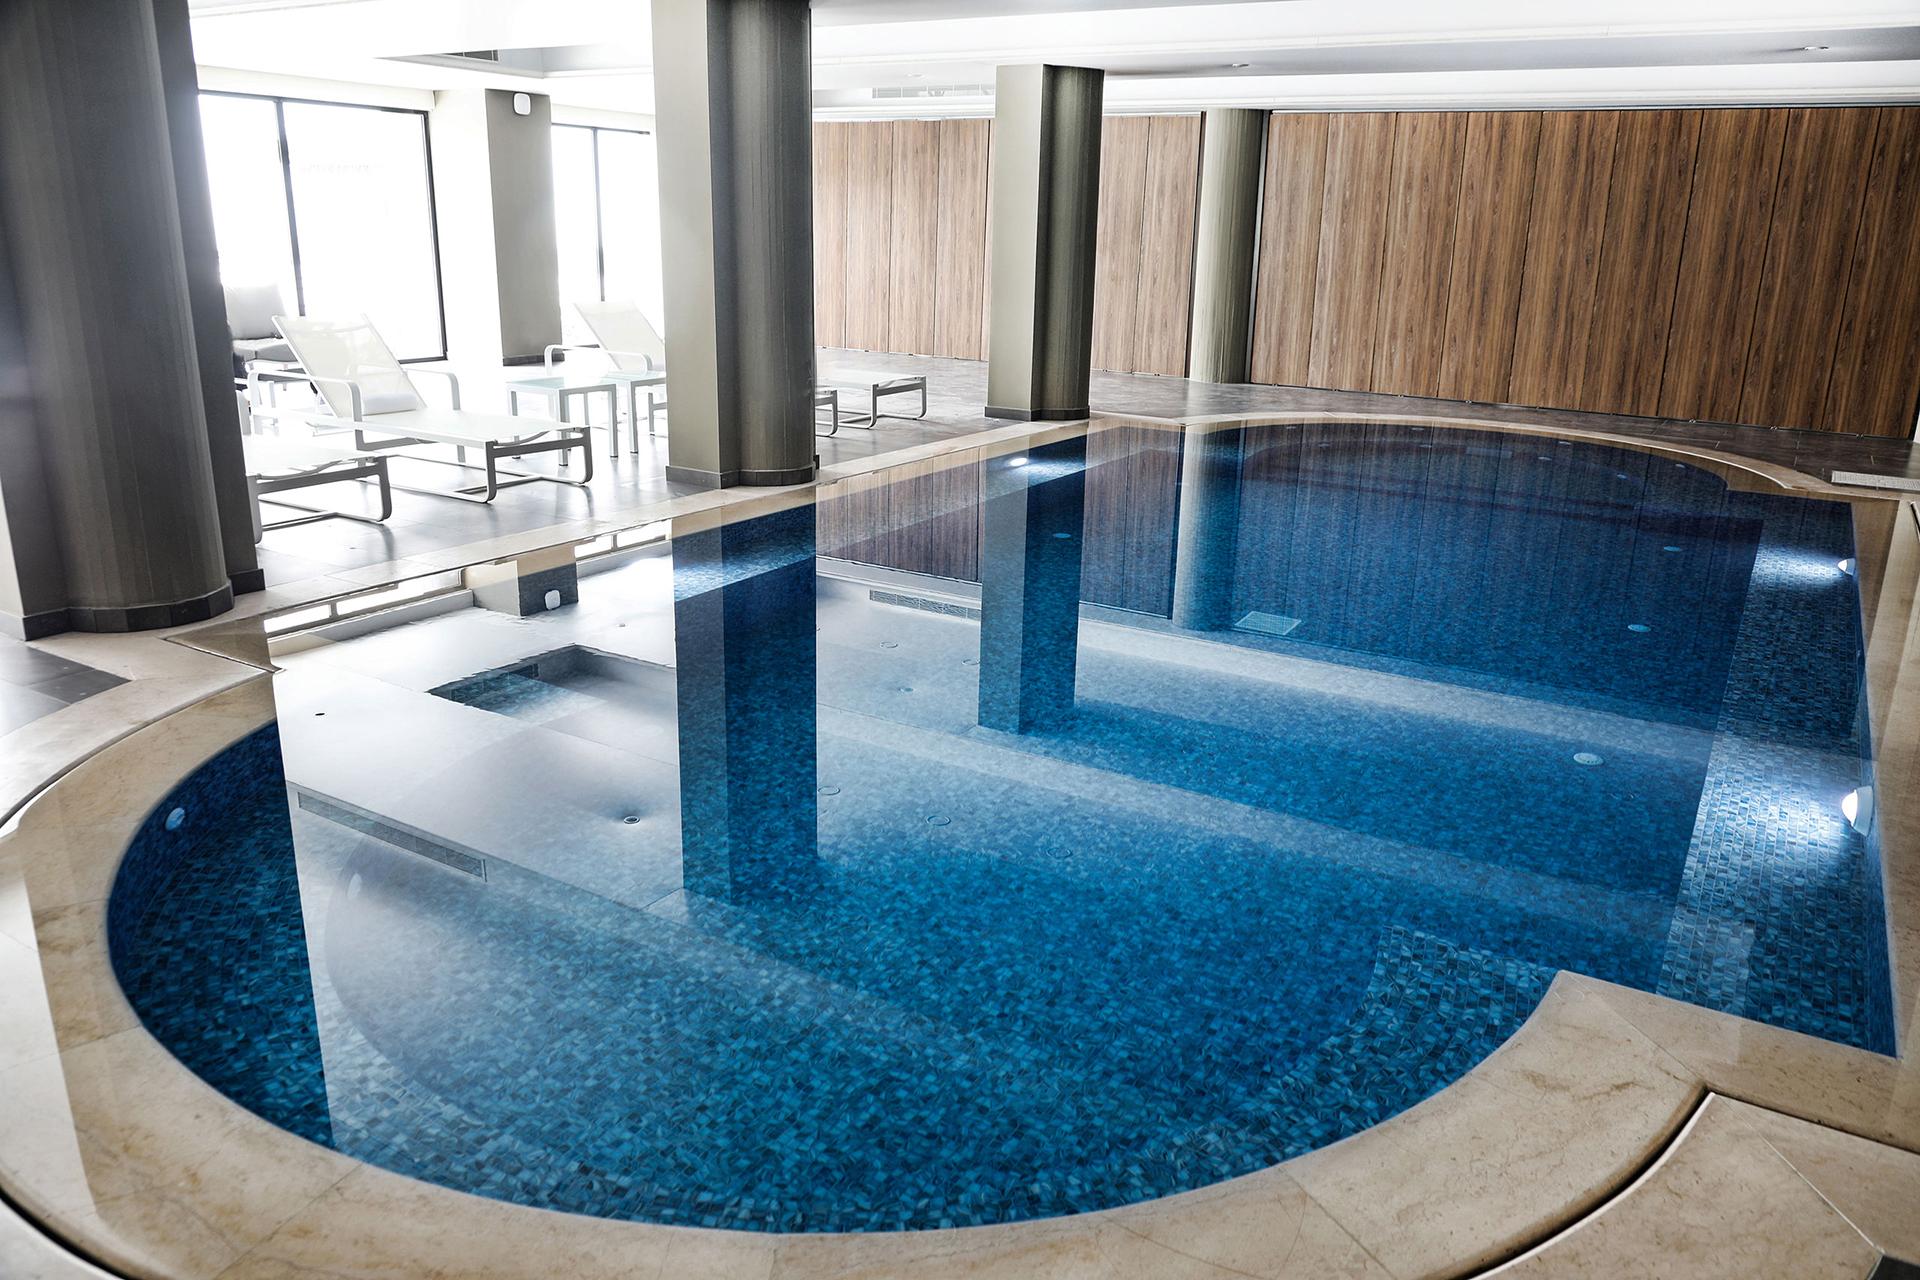 Le-Pave-Hotel-Lebanon-Beirut-Inside-Pool-1